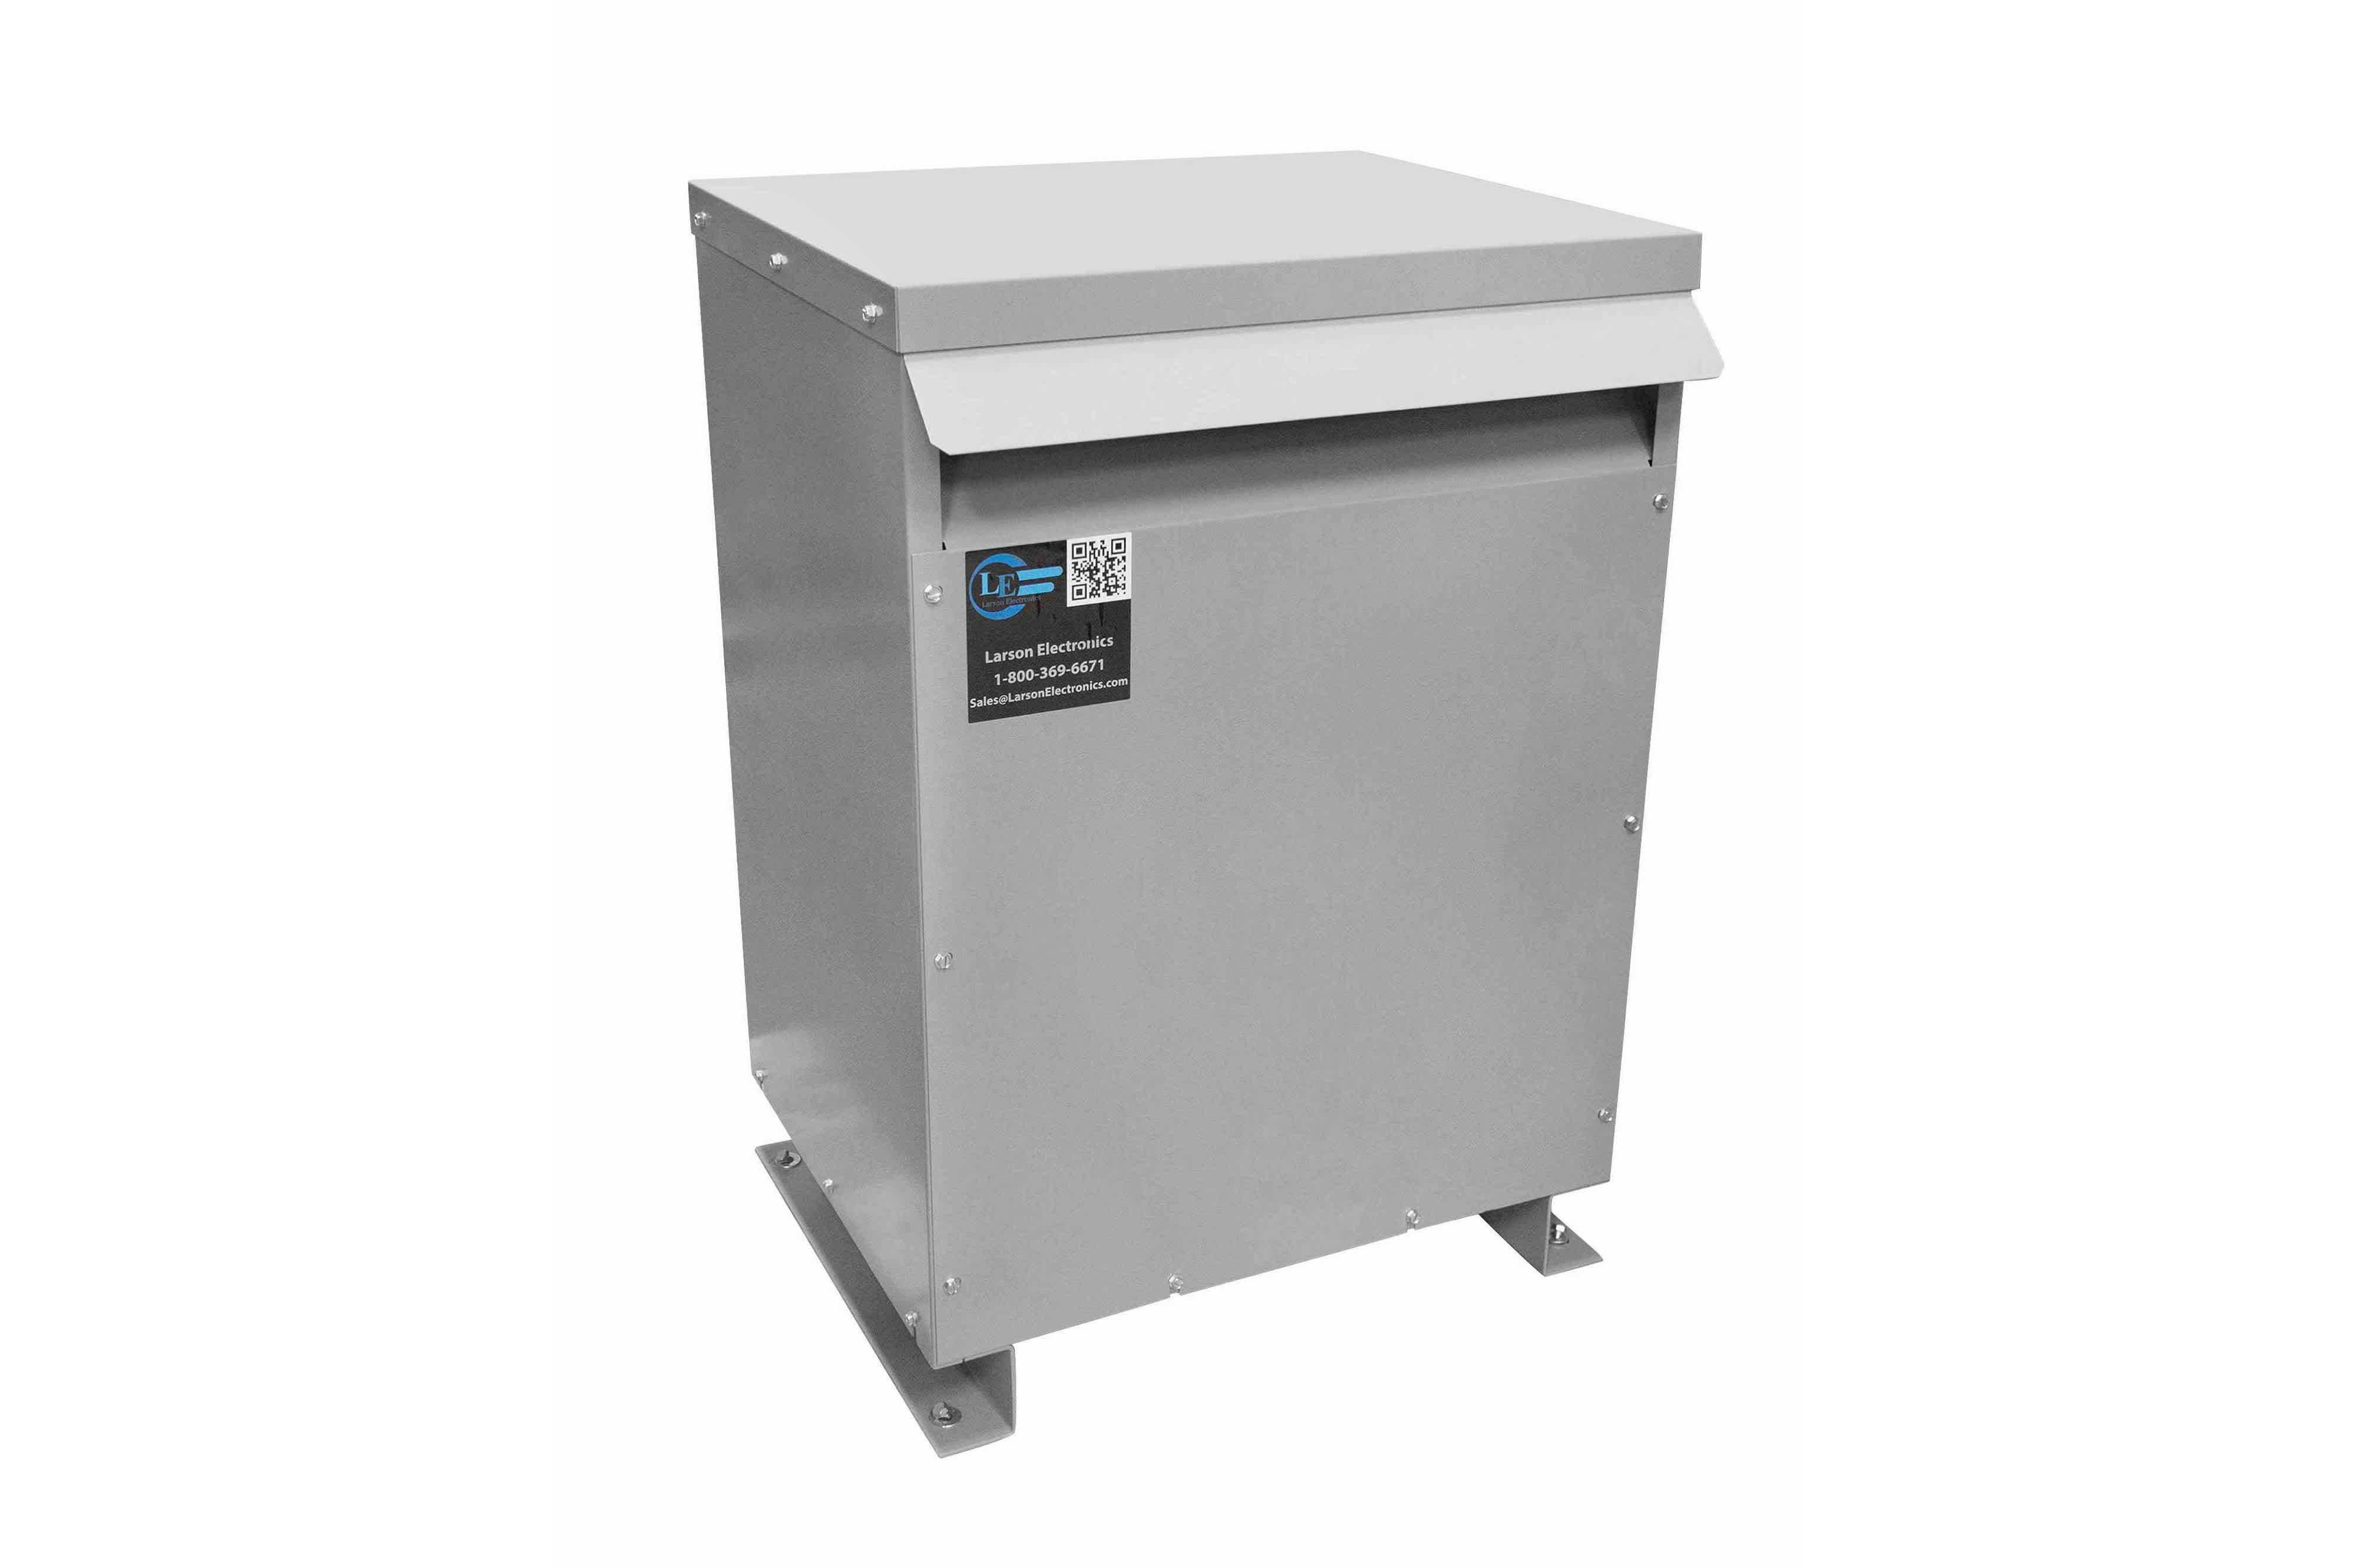 225 kVA 3PH Isolation Transformer, 400V Wye Primary, 240V/120 Delta Secondary, N3R, Ventilated, 60 Hz